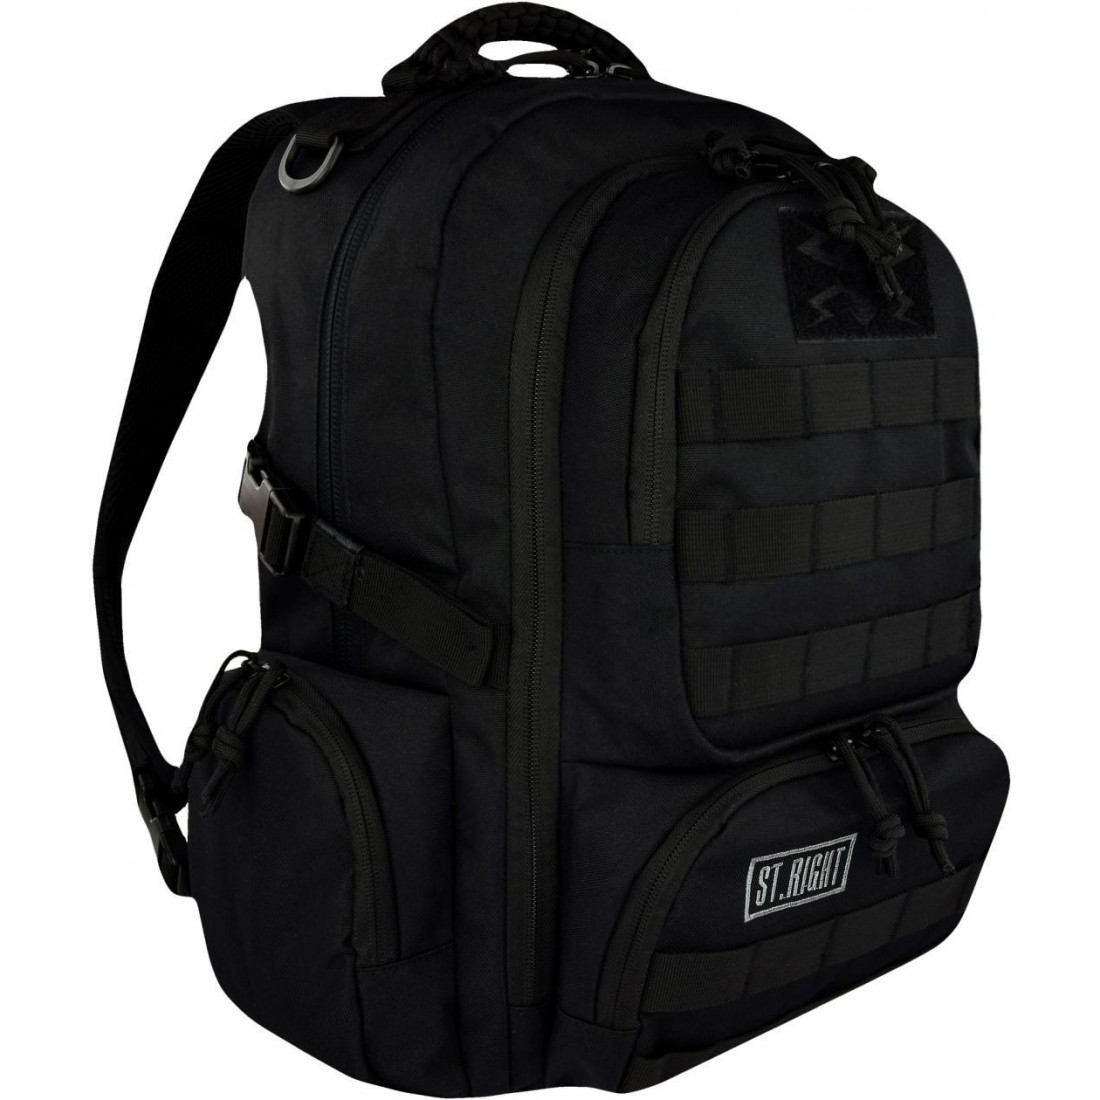 moda bardzo popularny 100% autentyczny Plecak camo 30 l. MILITARY BLACK czarny ST.RIGHT - BP36